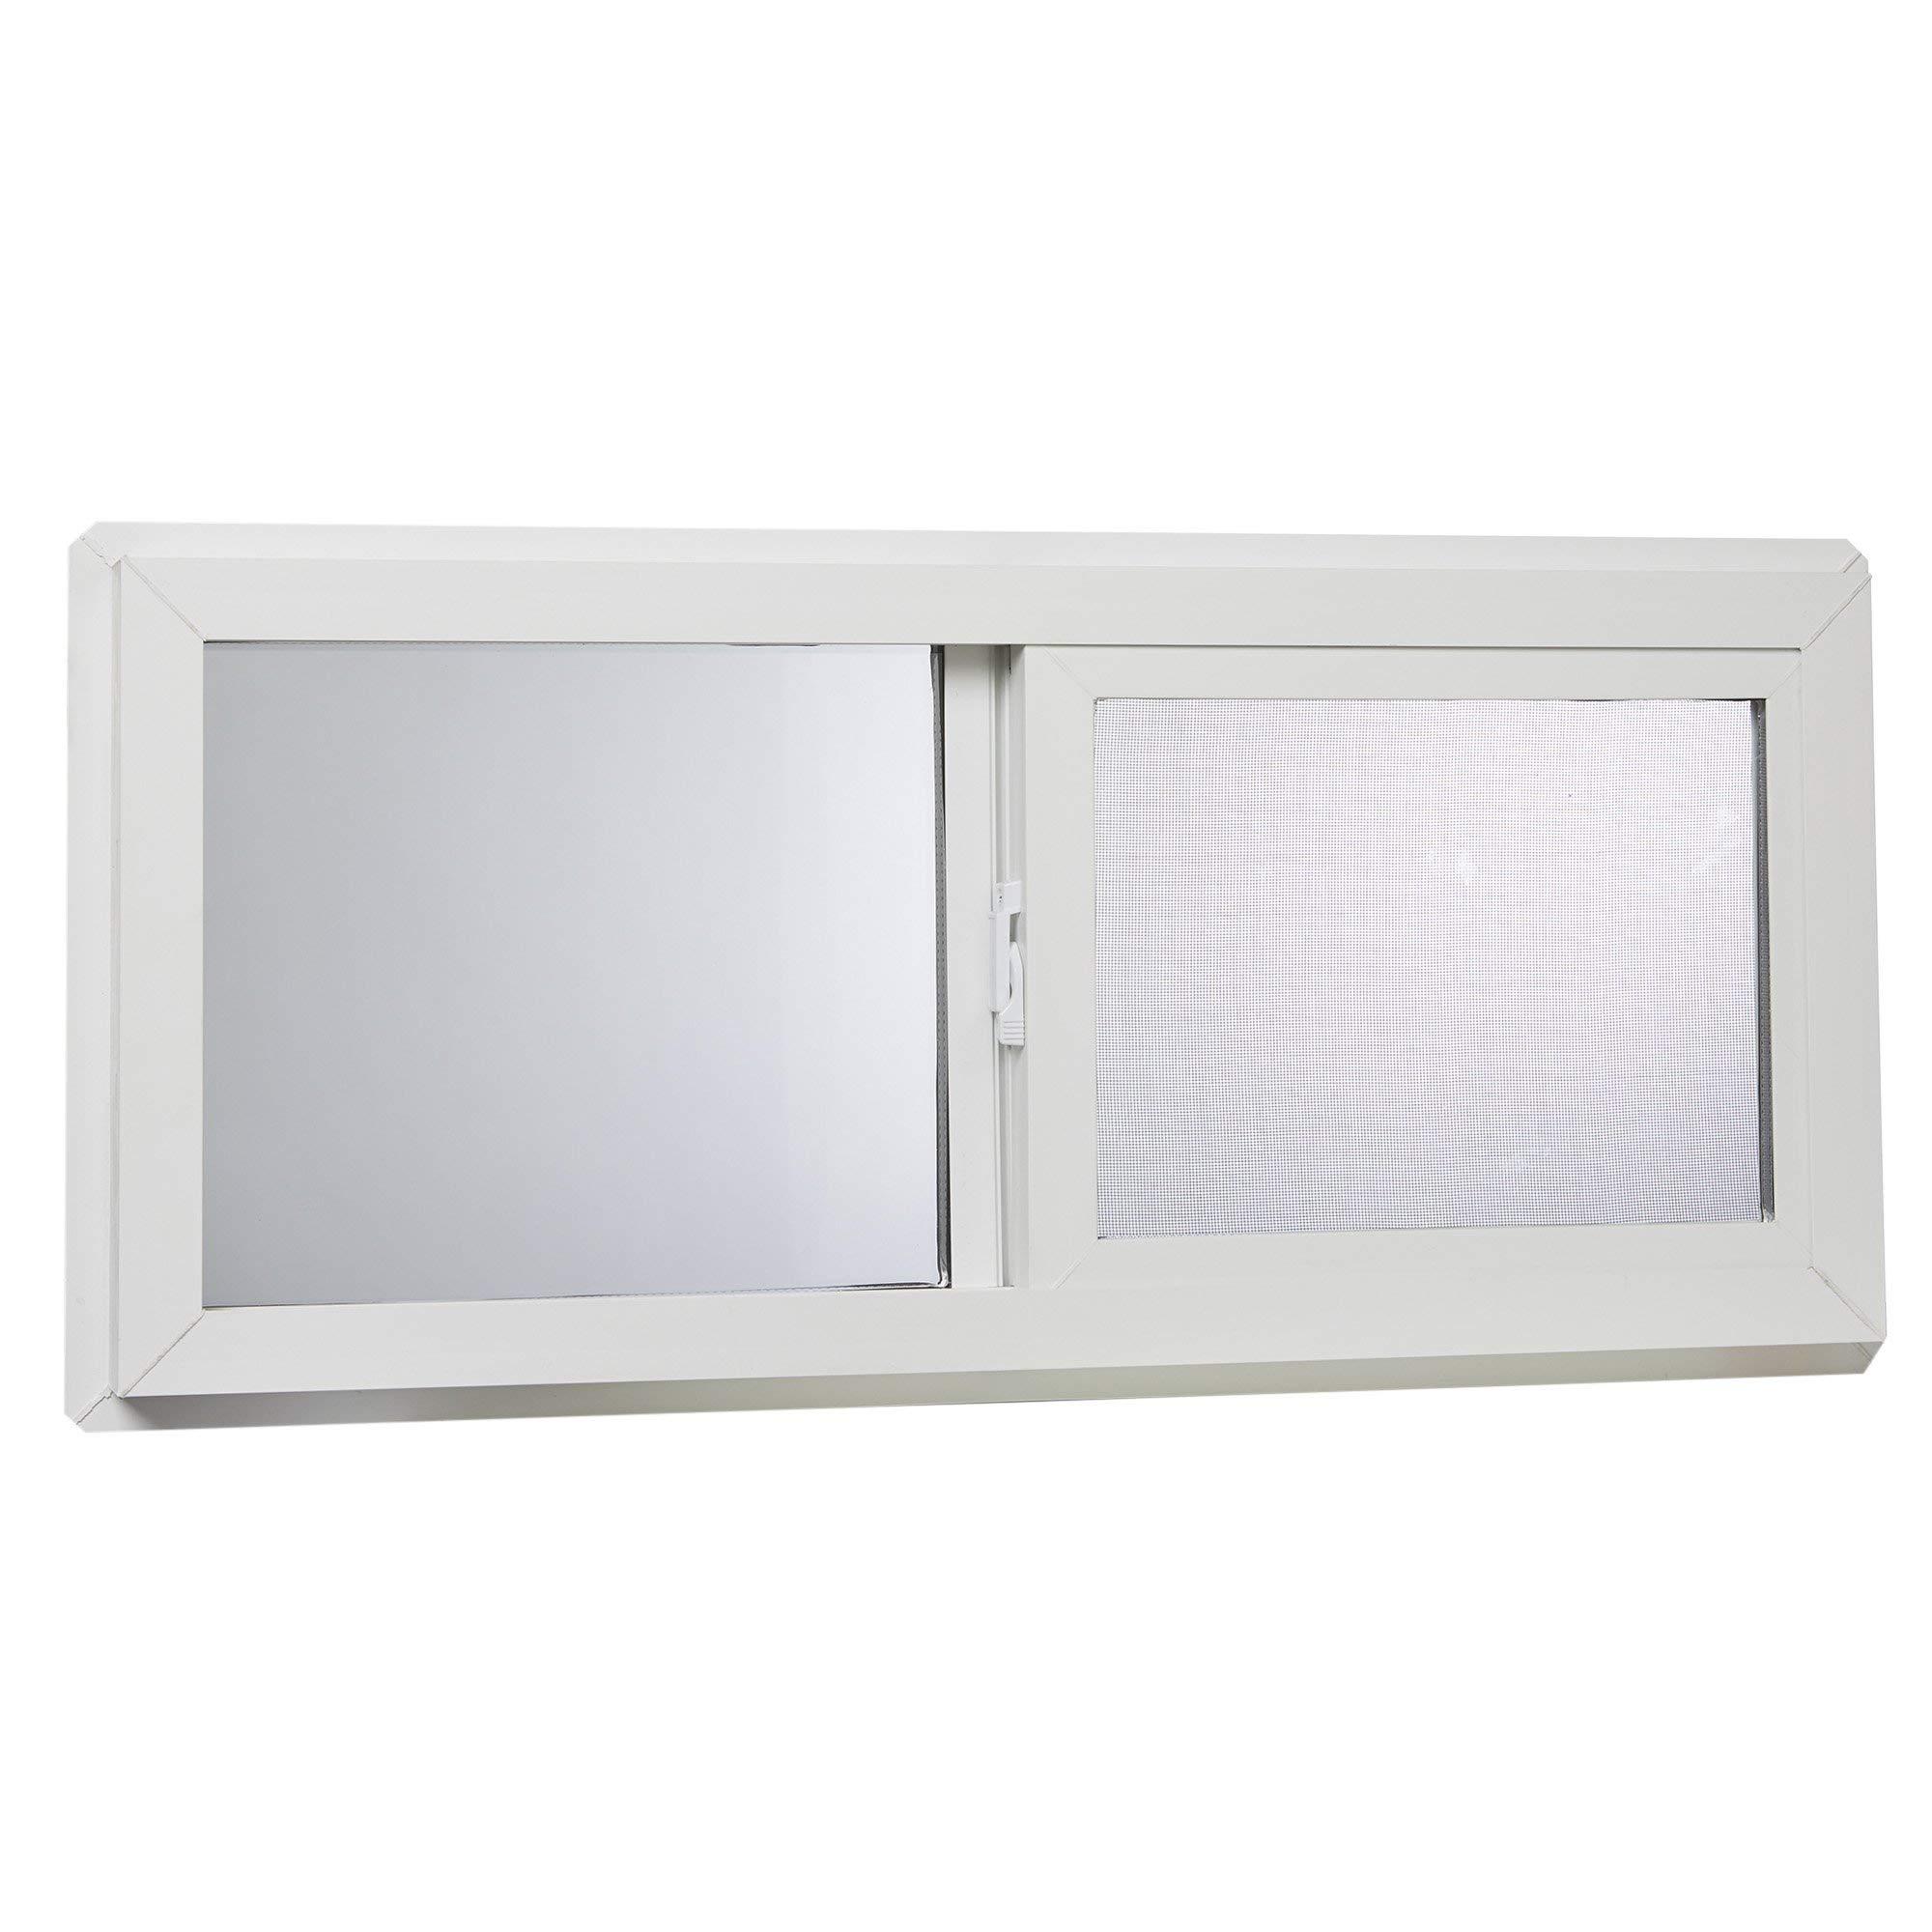 Park Ridge VBSI3214PR Vinyl Basement Slider Window, 32'' x 14'', White (Renewed) by Park Ridge Products